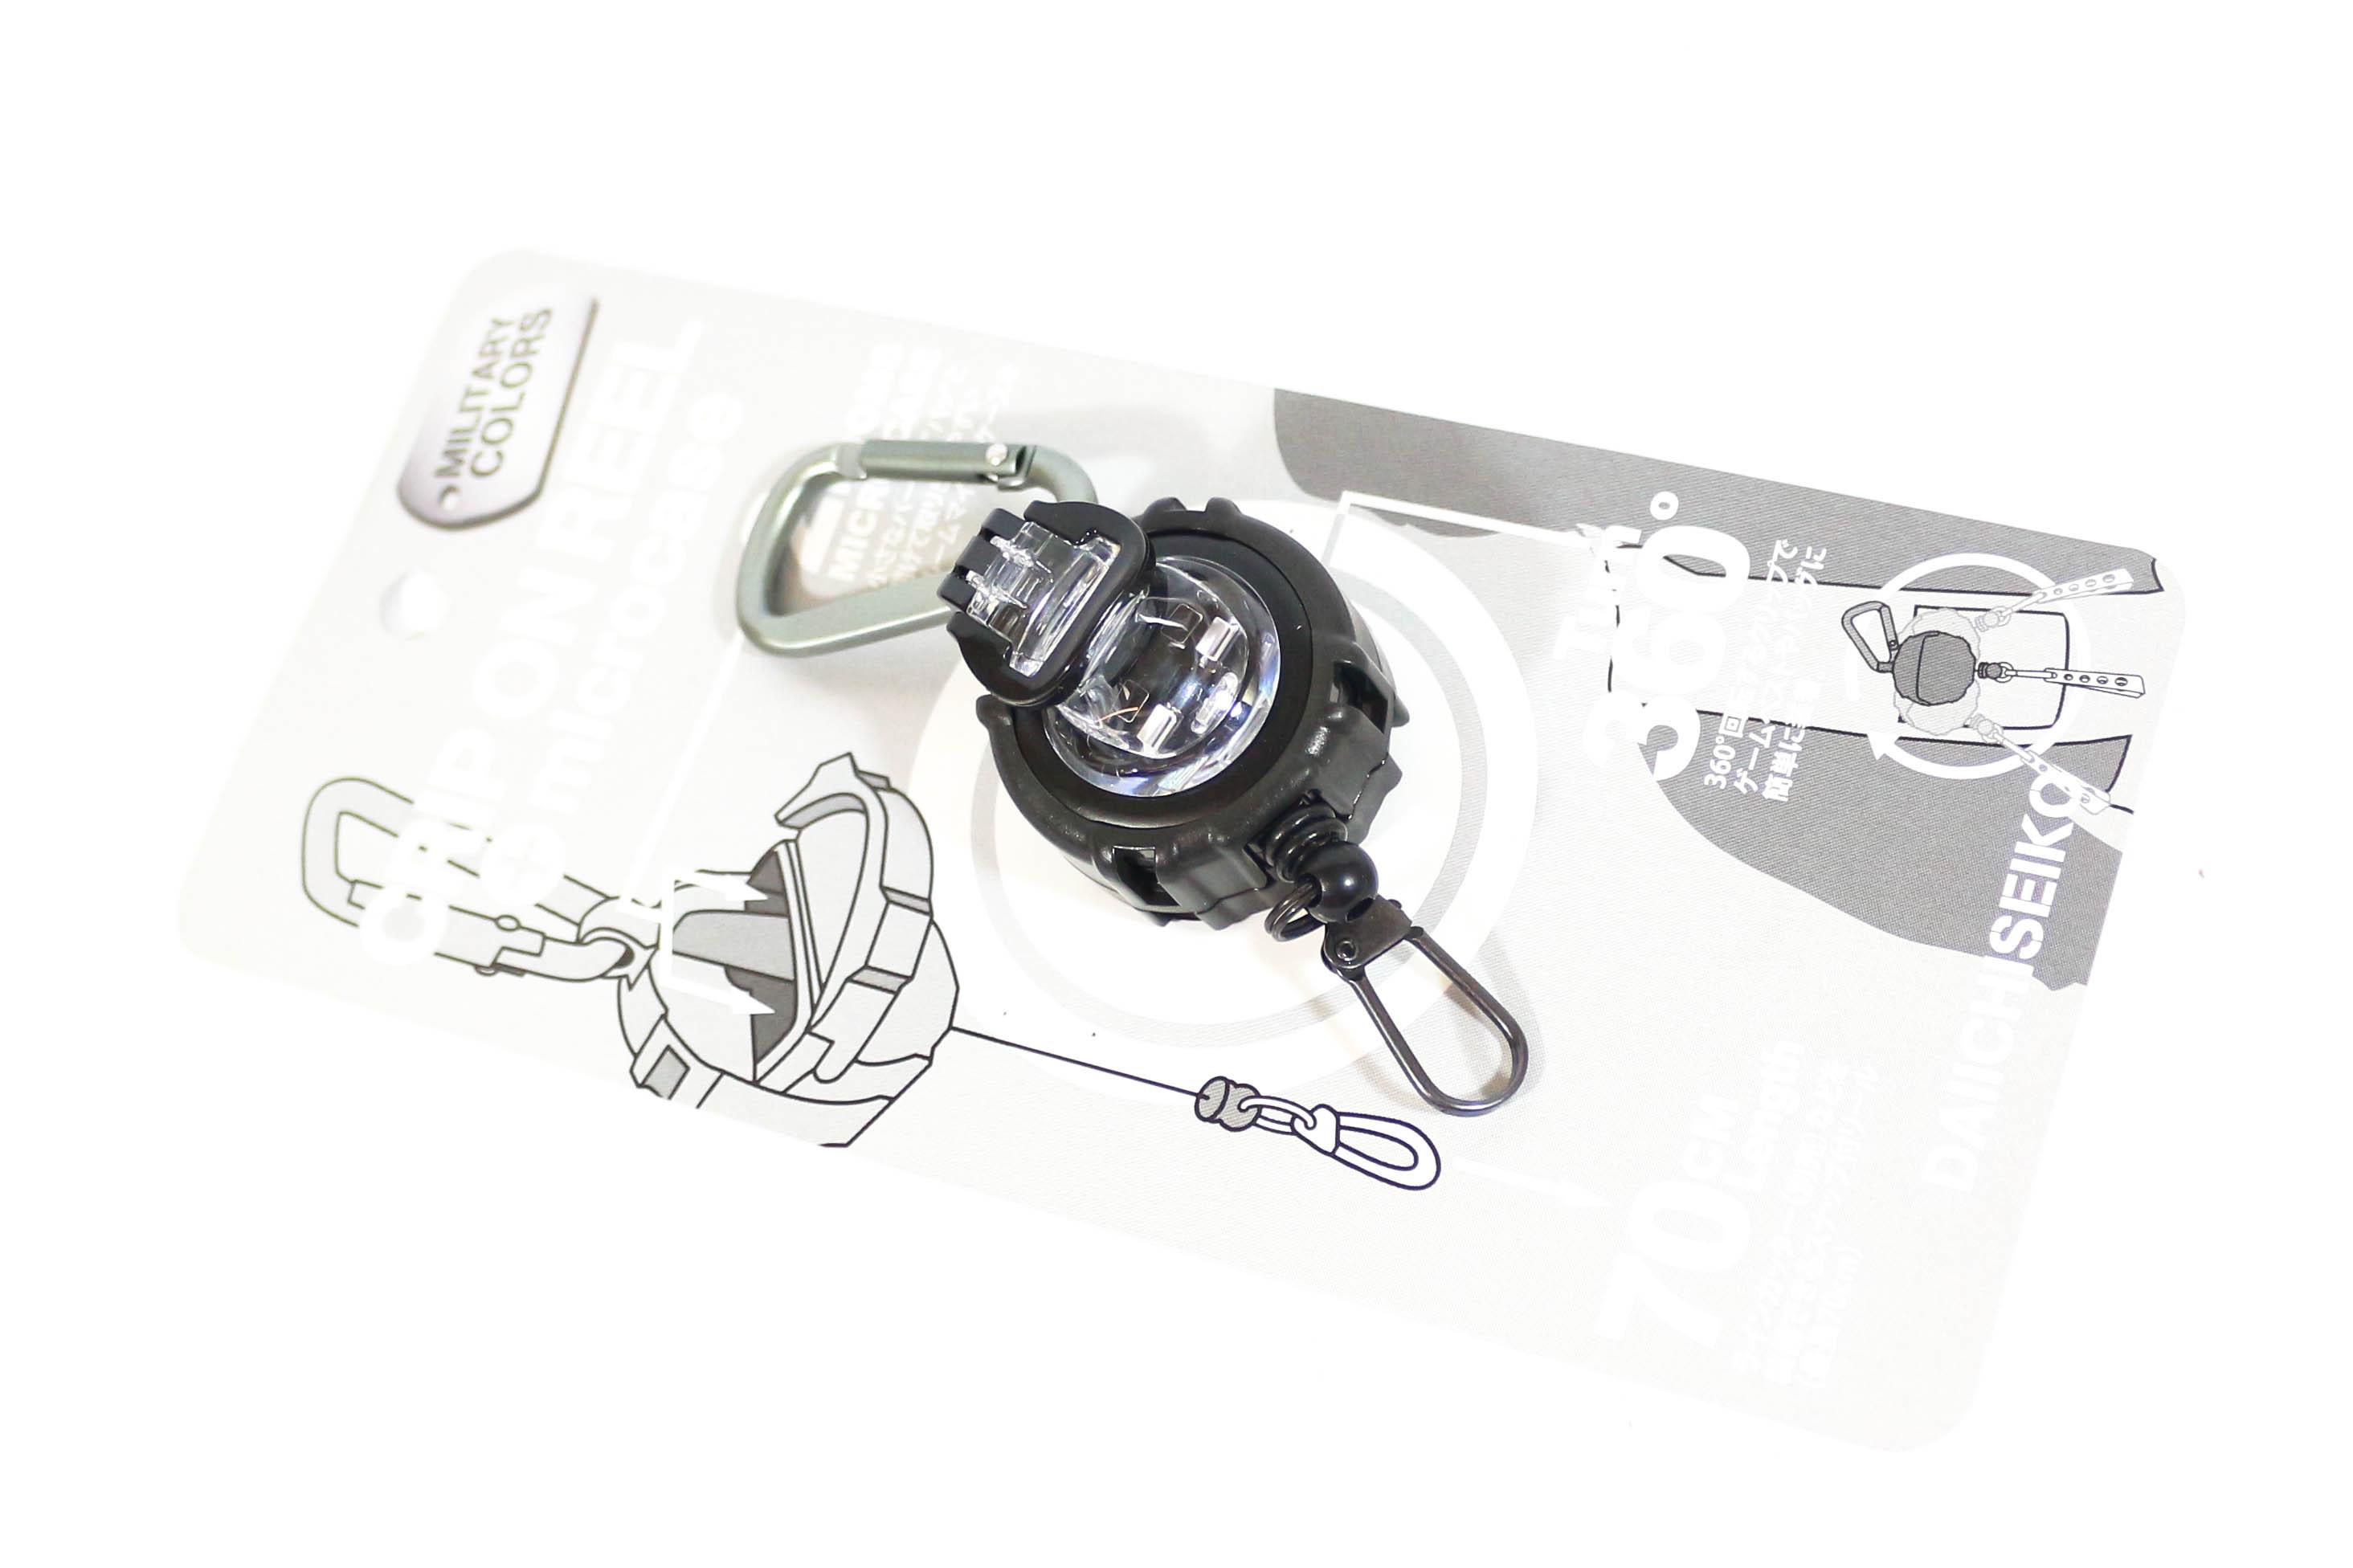 Daiichi #32151 Clip on Reel Micro Case Carabiner Black (1516)